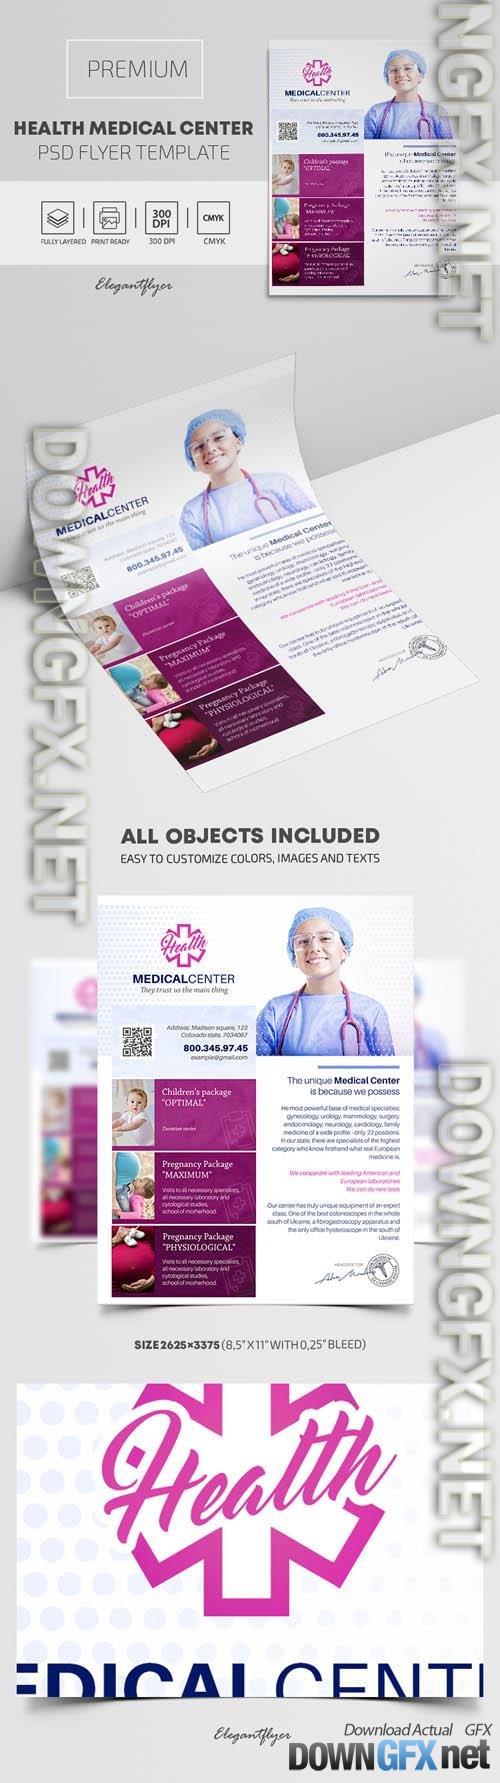 Health Medical Center Premium PSD Flyer Template